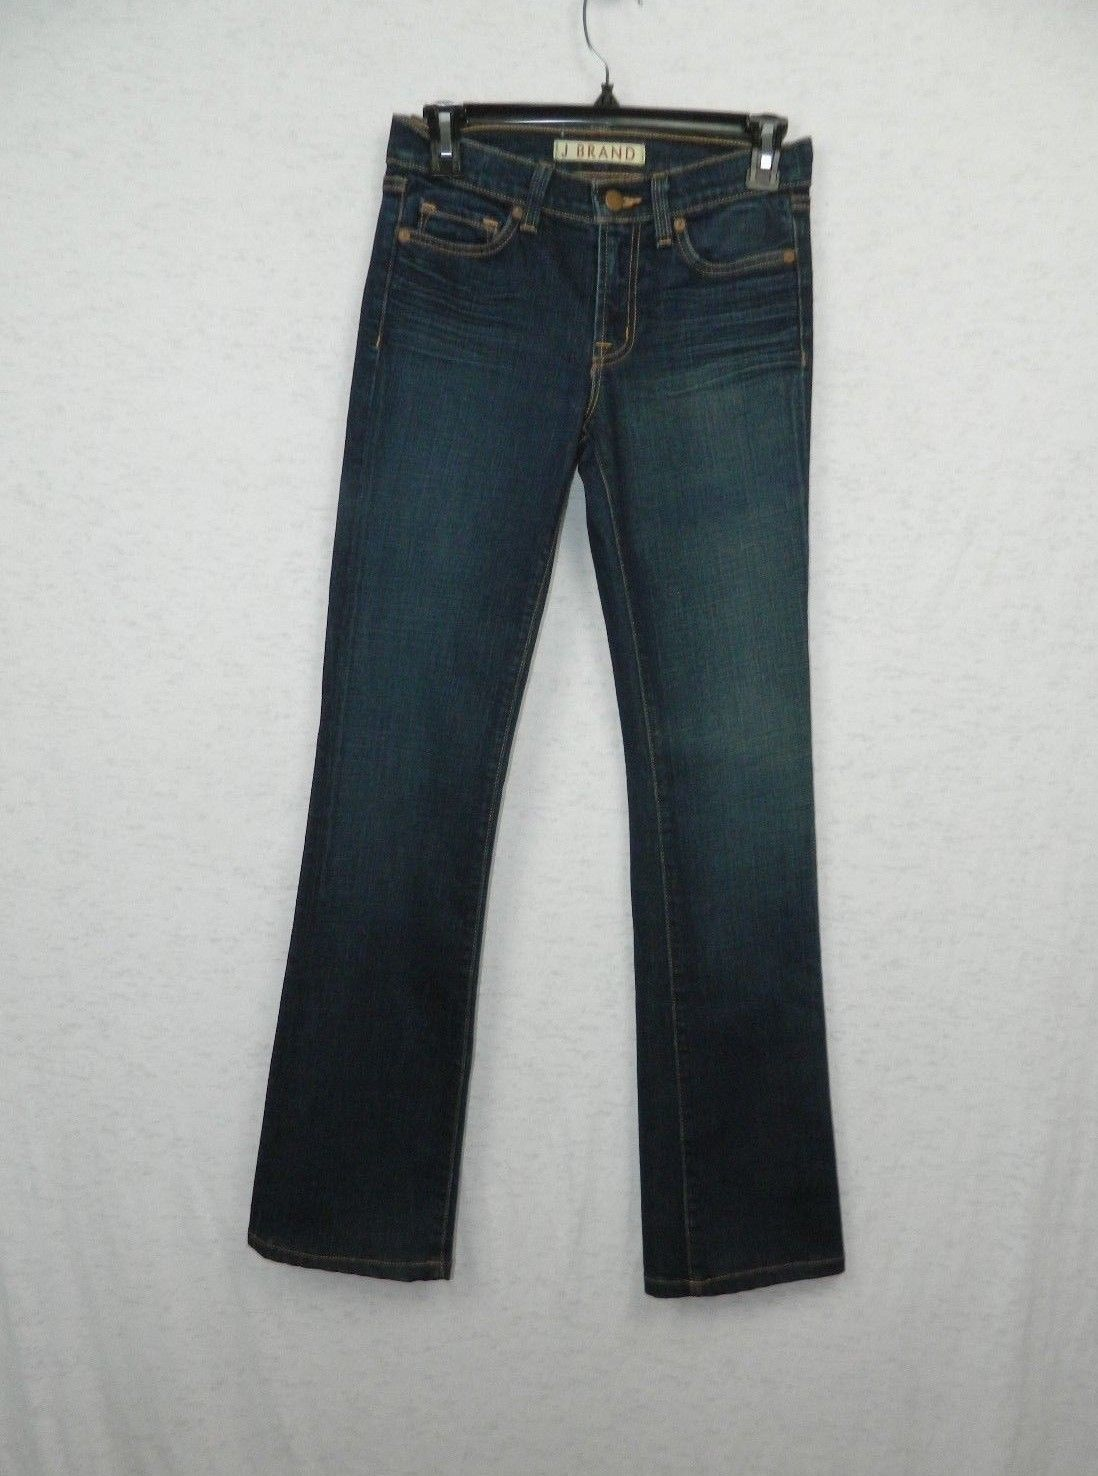 J Brand Jeans Straight Leg Jeans  Dark Wash Style #805 Size 25 image 3